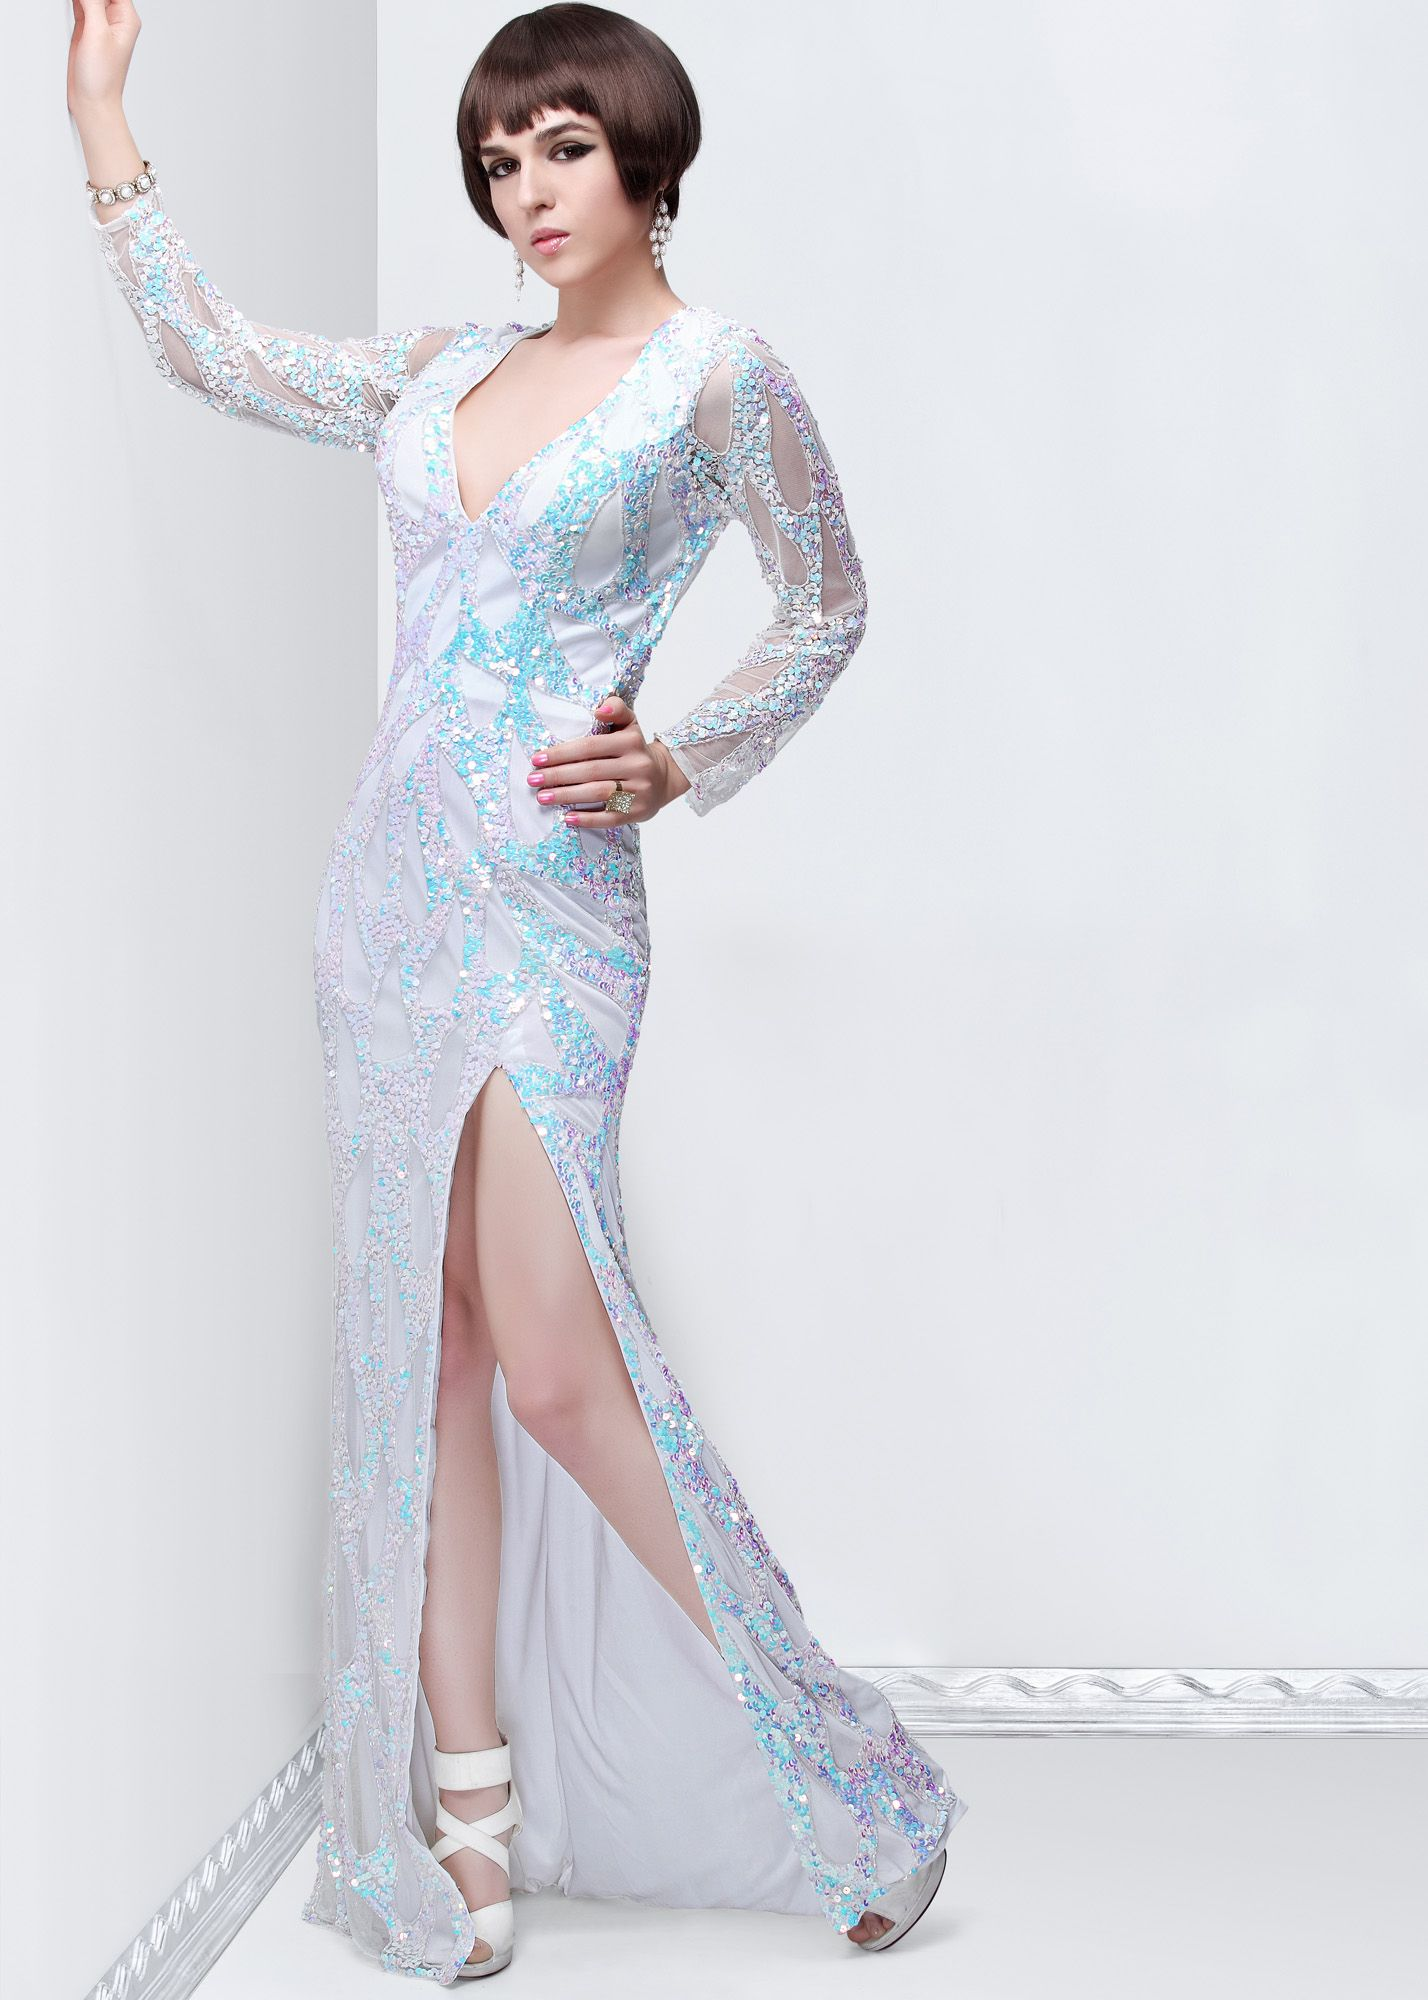 Primavera ivory high neck sequin prom dresses online